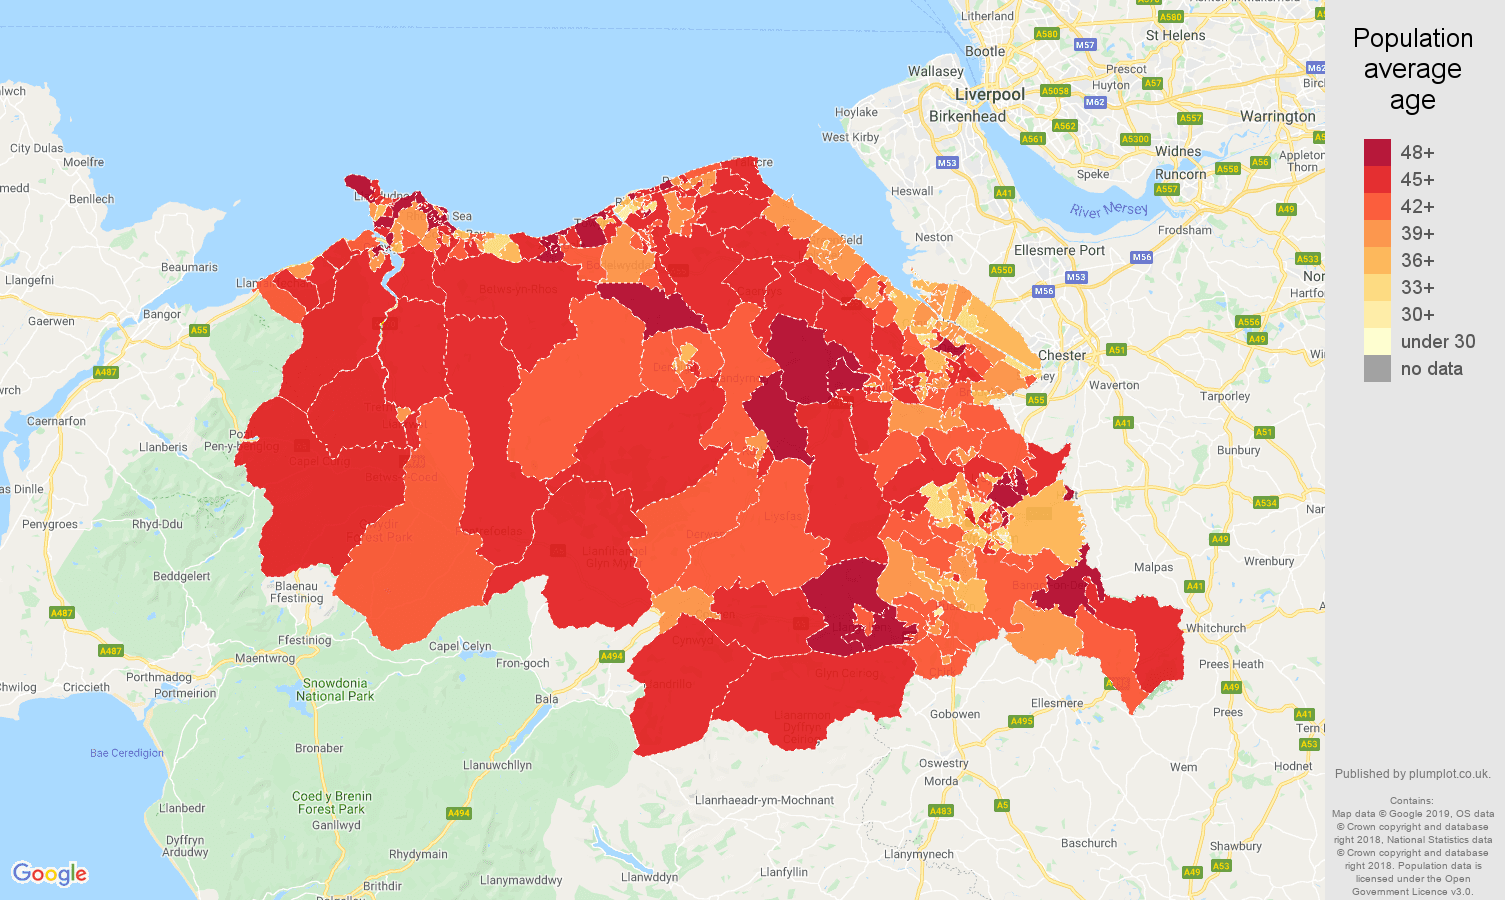 Clwyd population average age map